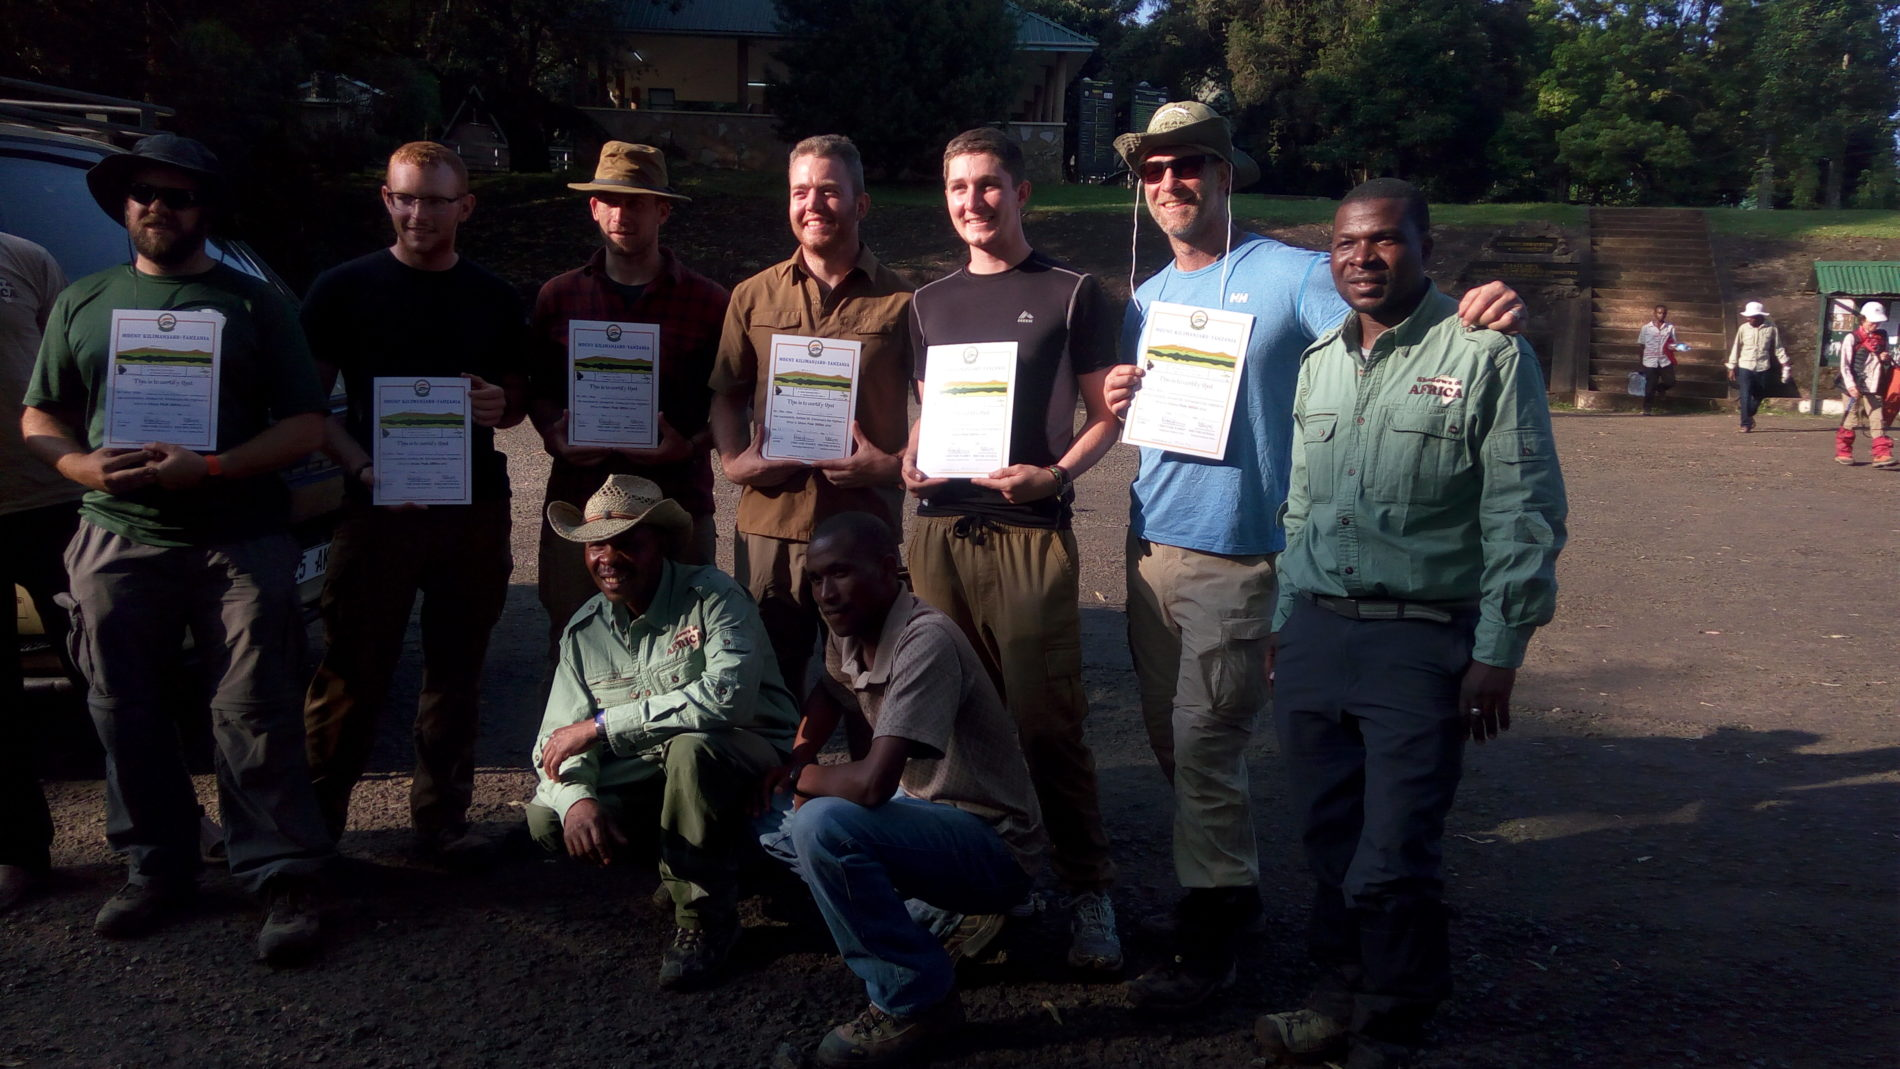 Kilimanjaro climb certificates